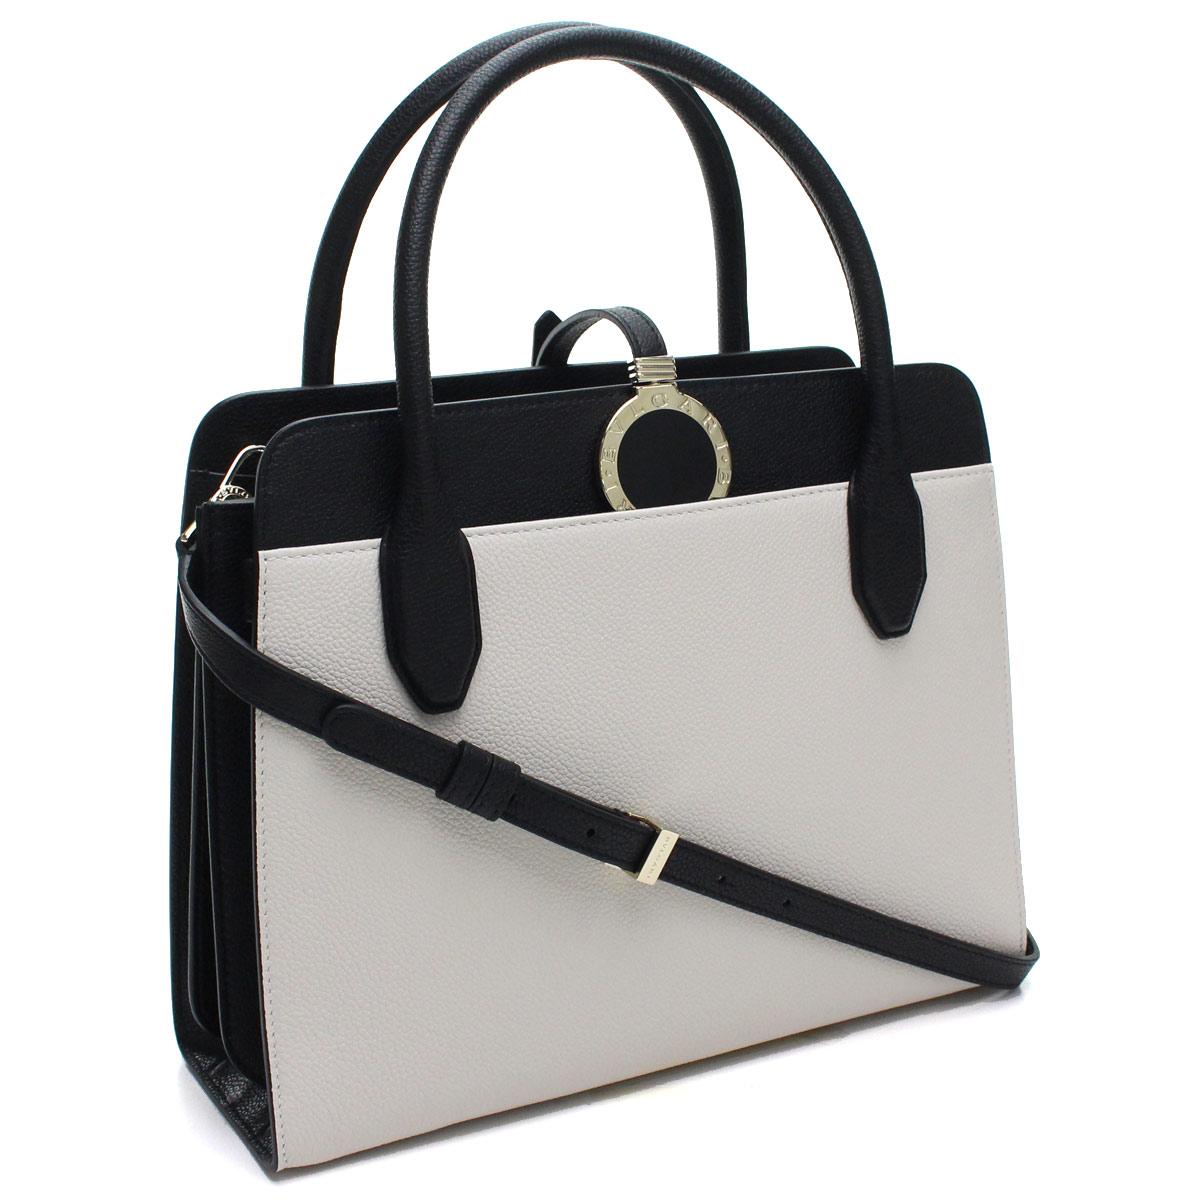 d8249184c91 Bulgari BVLGARI Bulgari Bulgari ALBA tote bag 282797 GRAIN CALF LEATHER  WHITE AGATE white system black Lady's